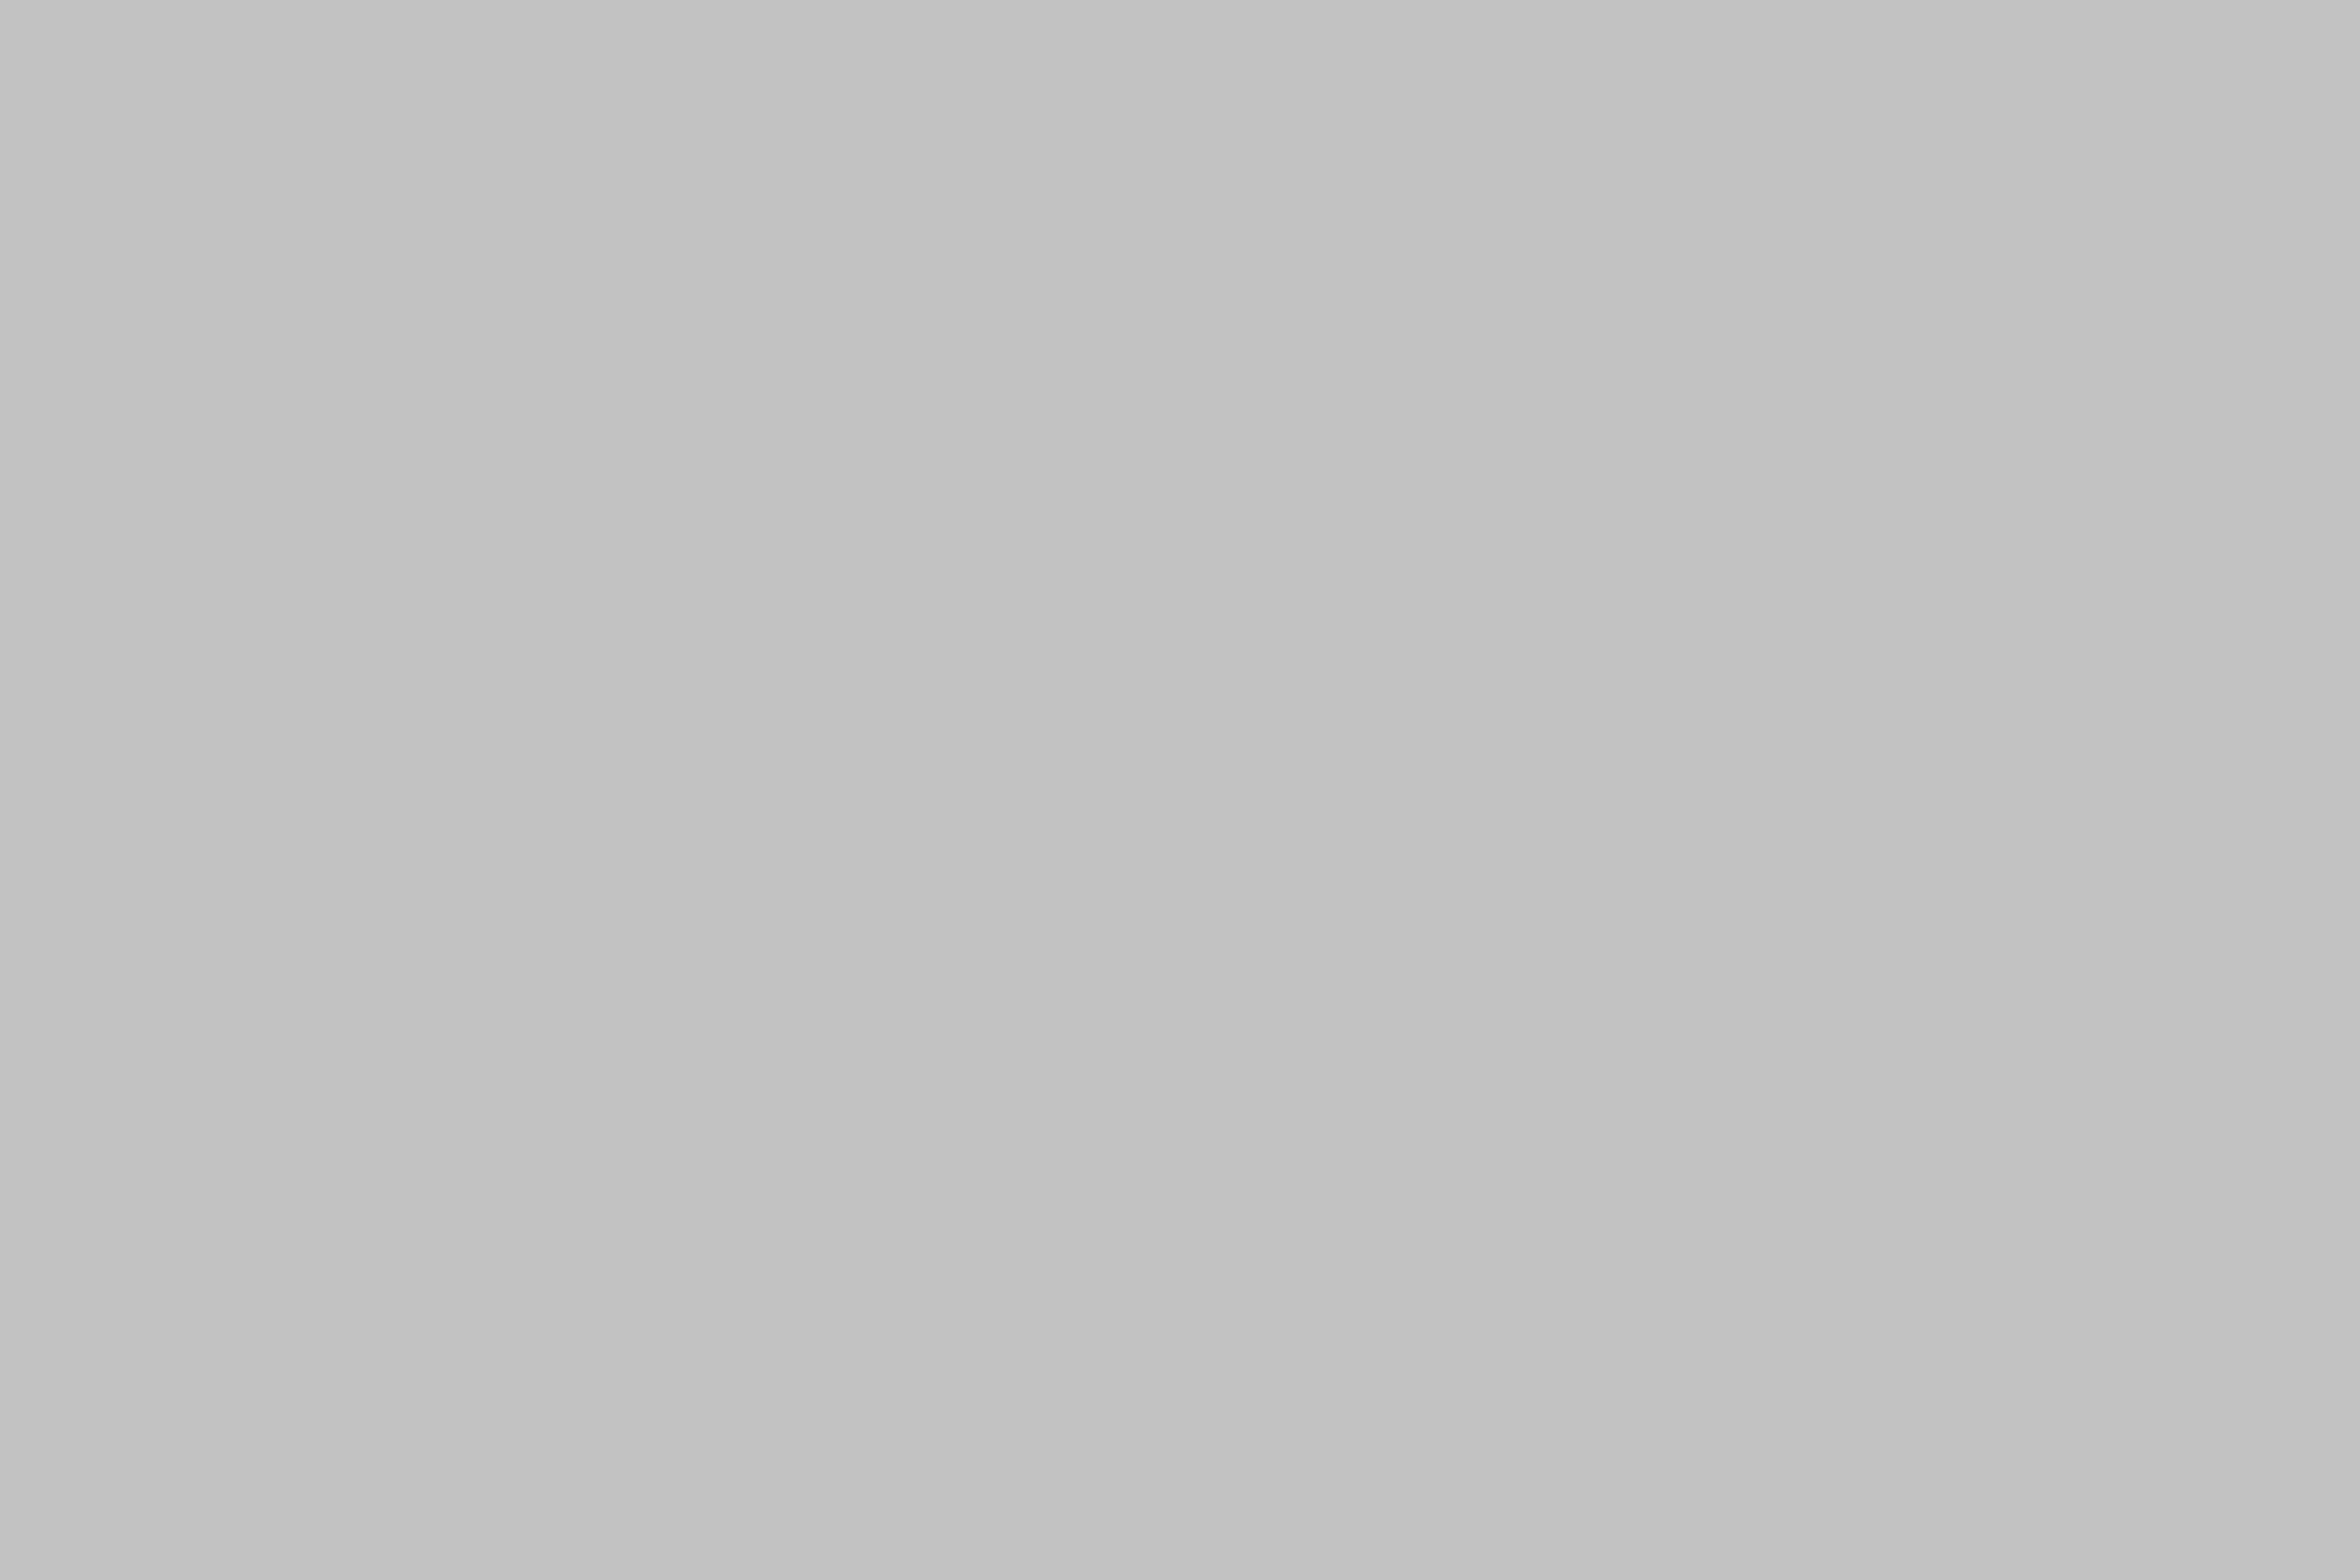 SquareSpace-SermonSeries copy 6.jpg